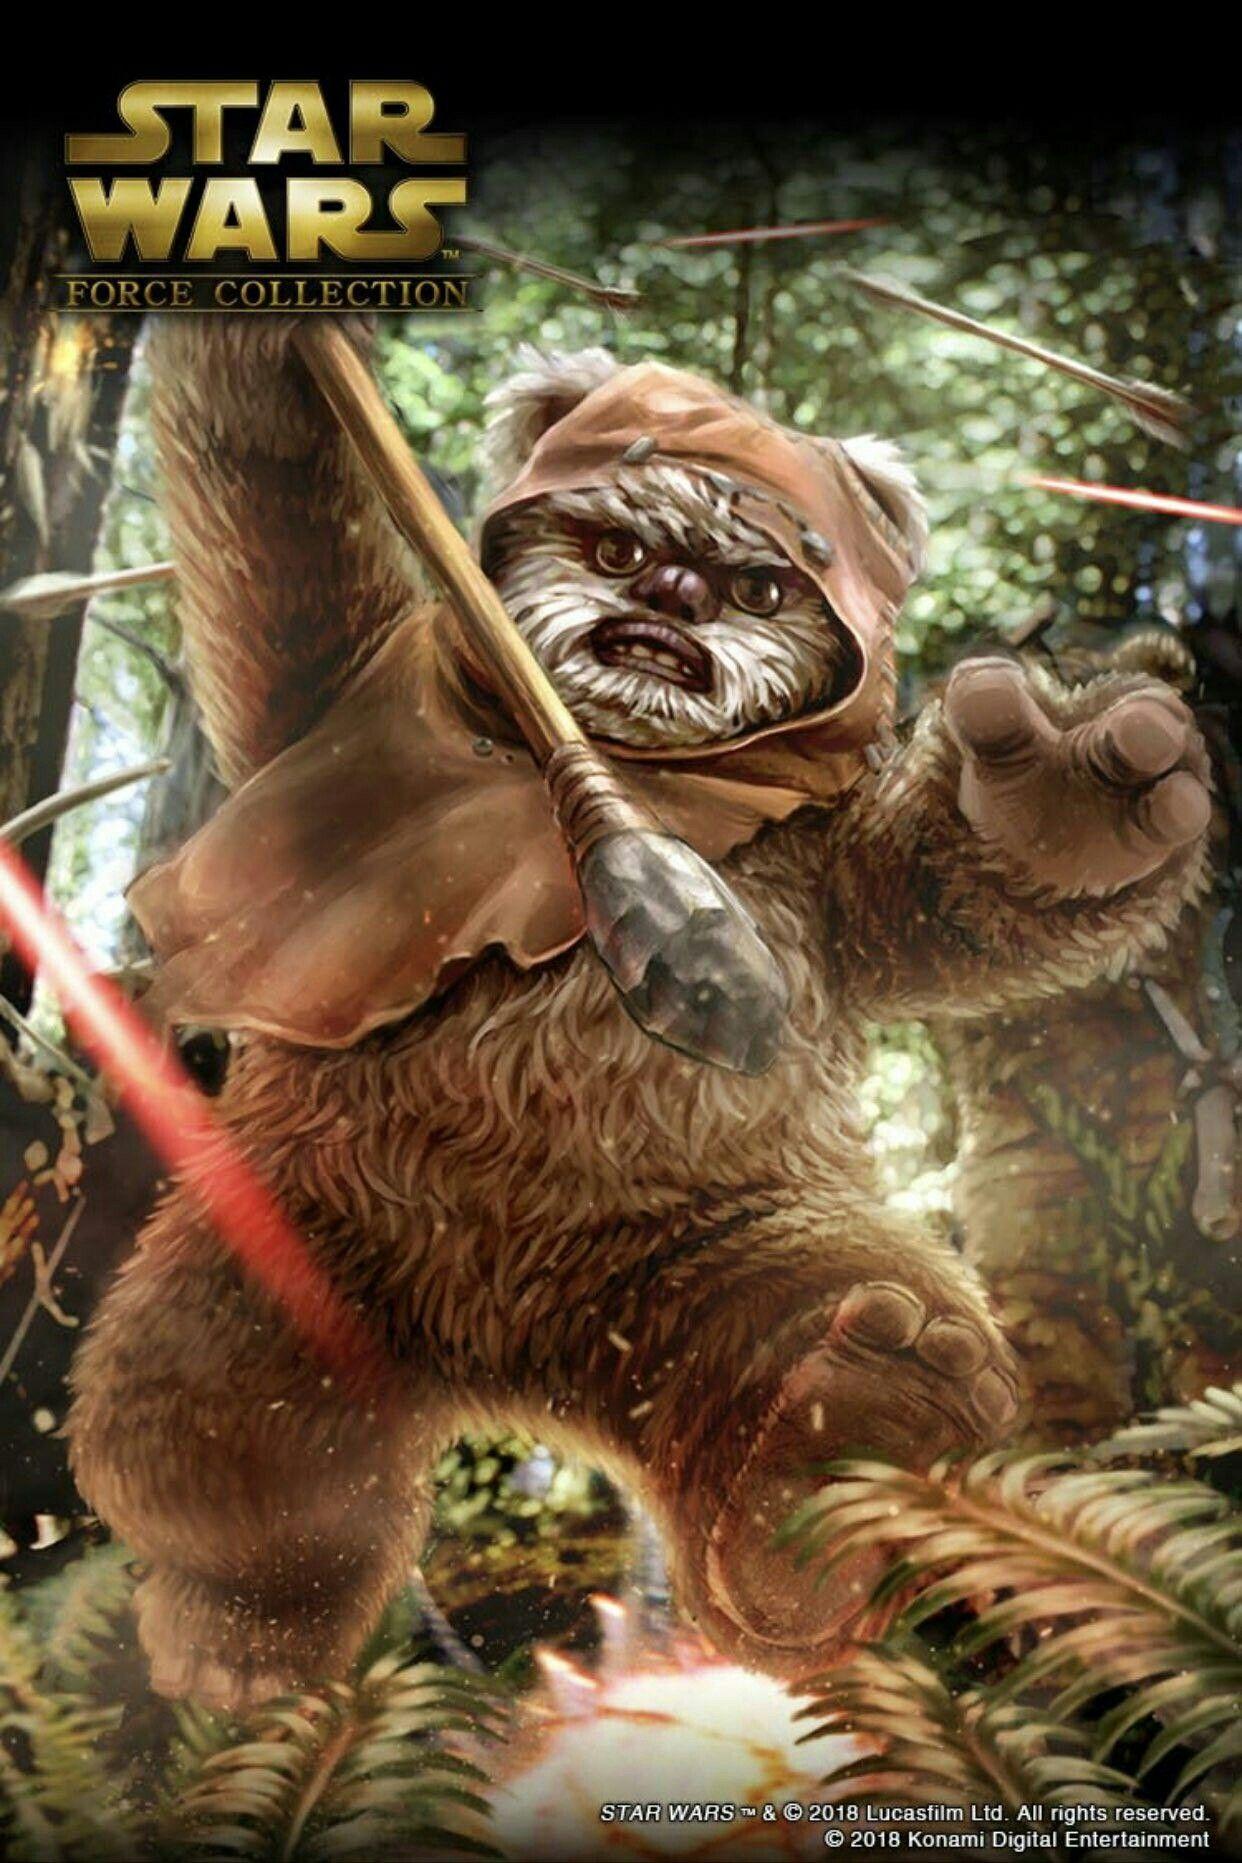 Star Wars Battlefront Ii Ewok Hunt Game Mode Star Wars Force Collection Star Wars Pictures Star Wars Images